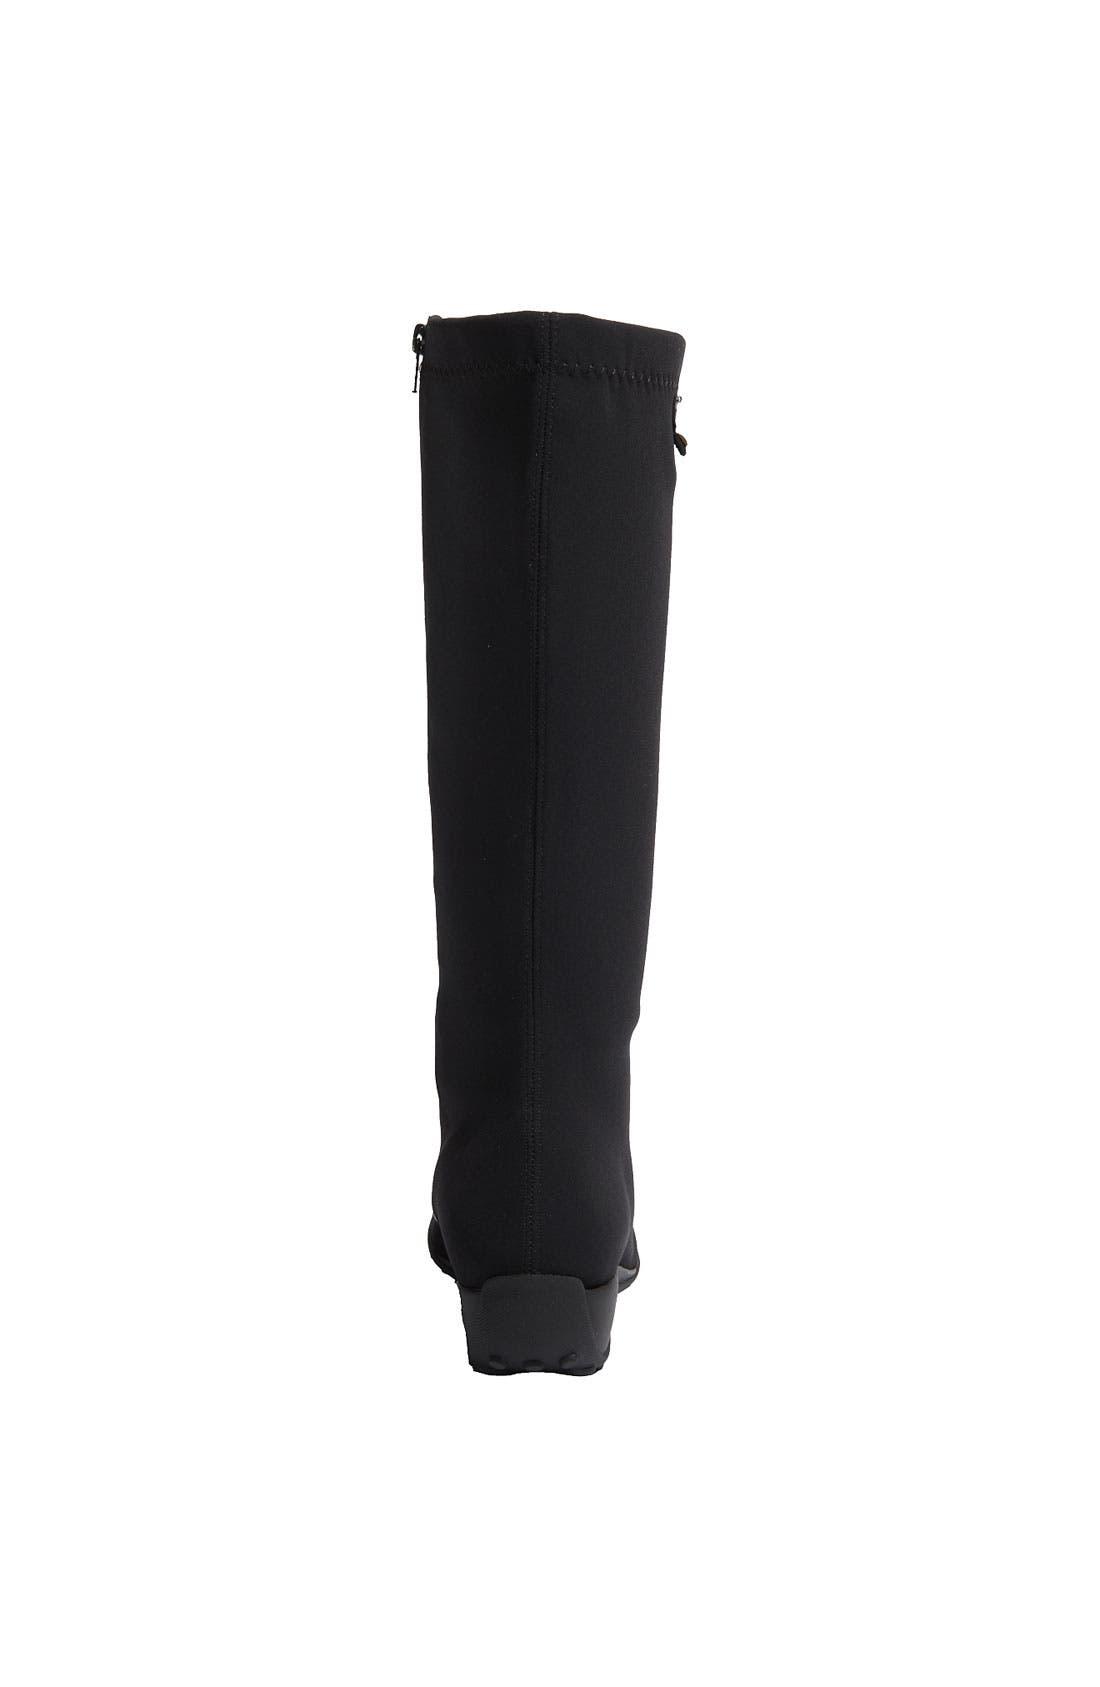 'Linda' Waterproof Stretch Boot,                             Alternate thumbnail 3, color,                             009